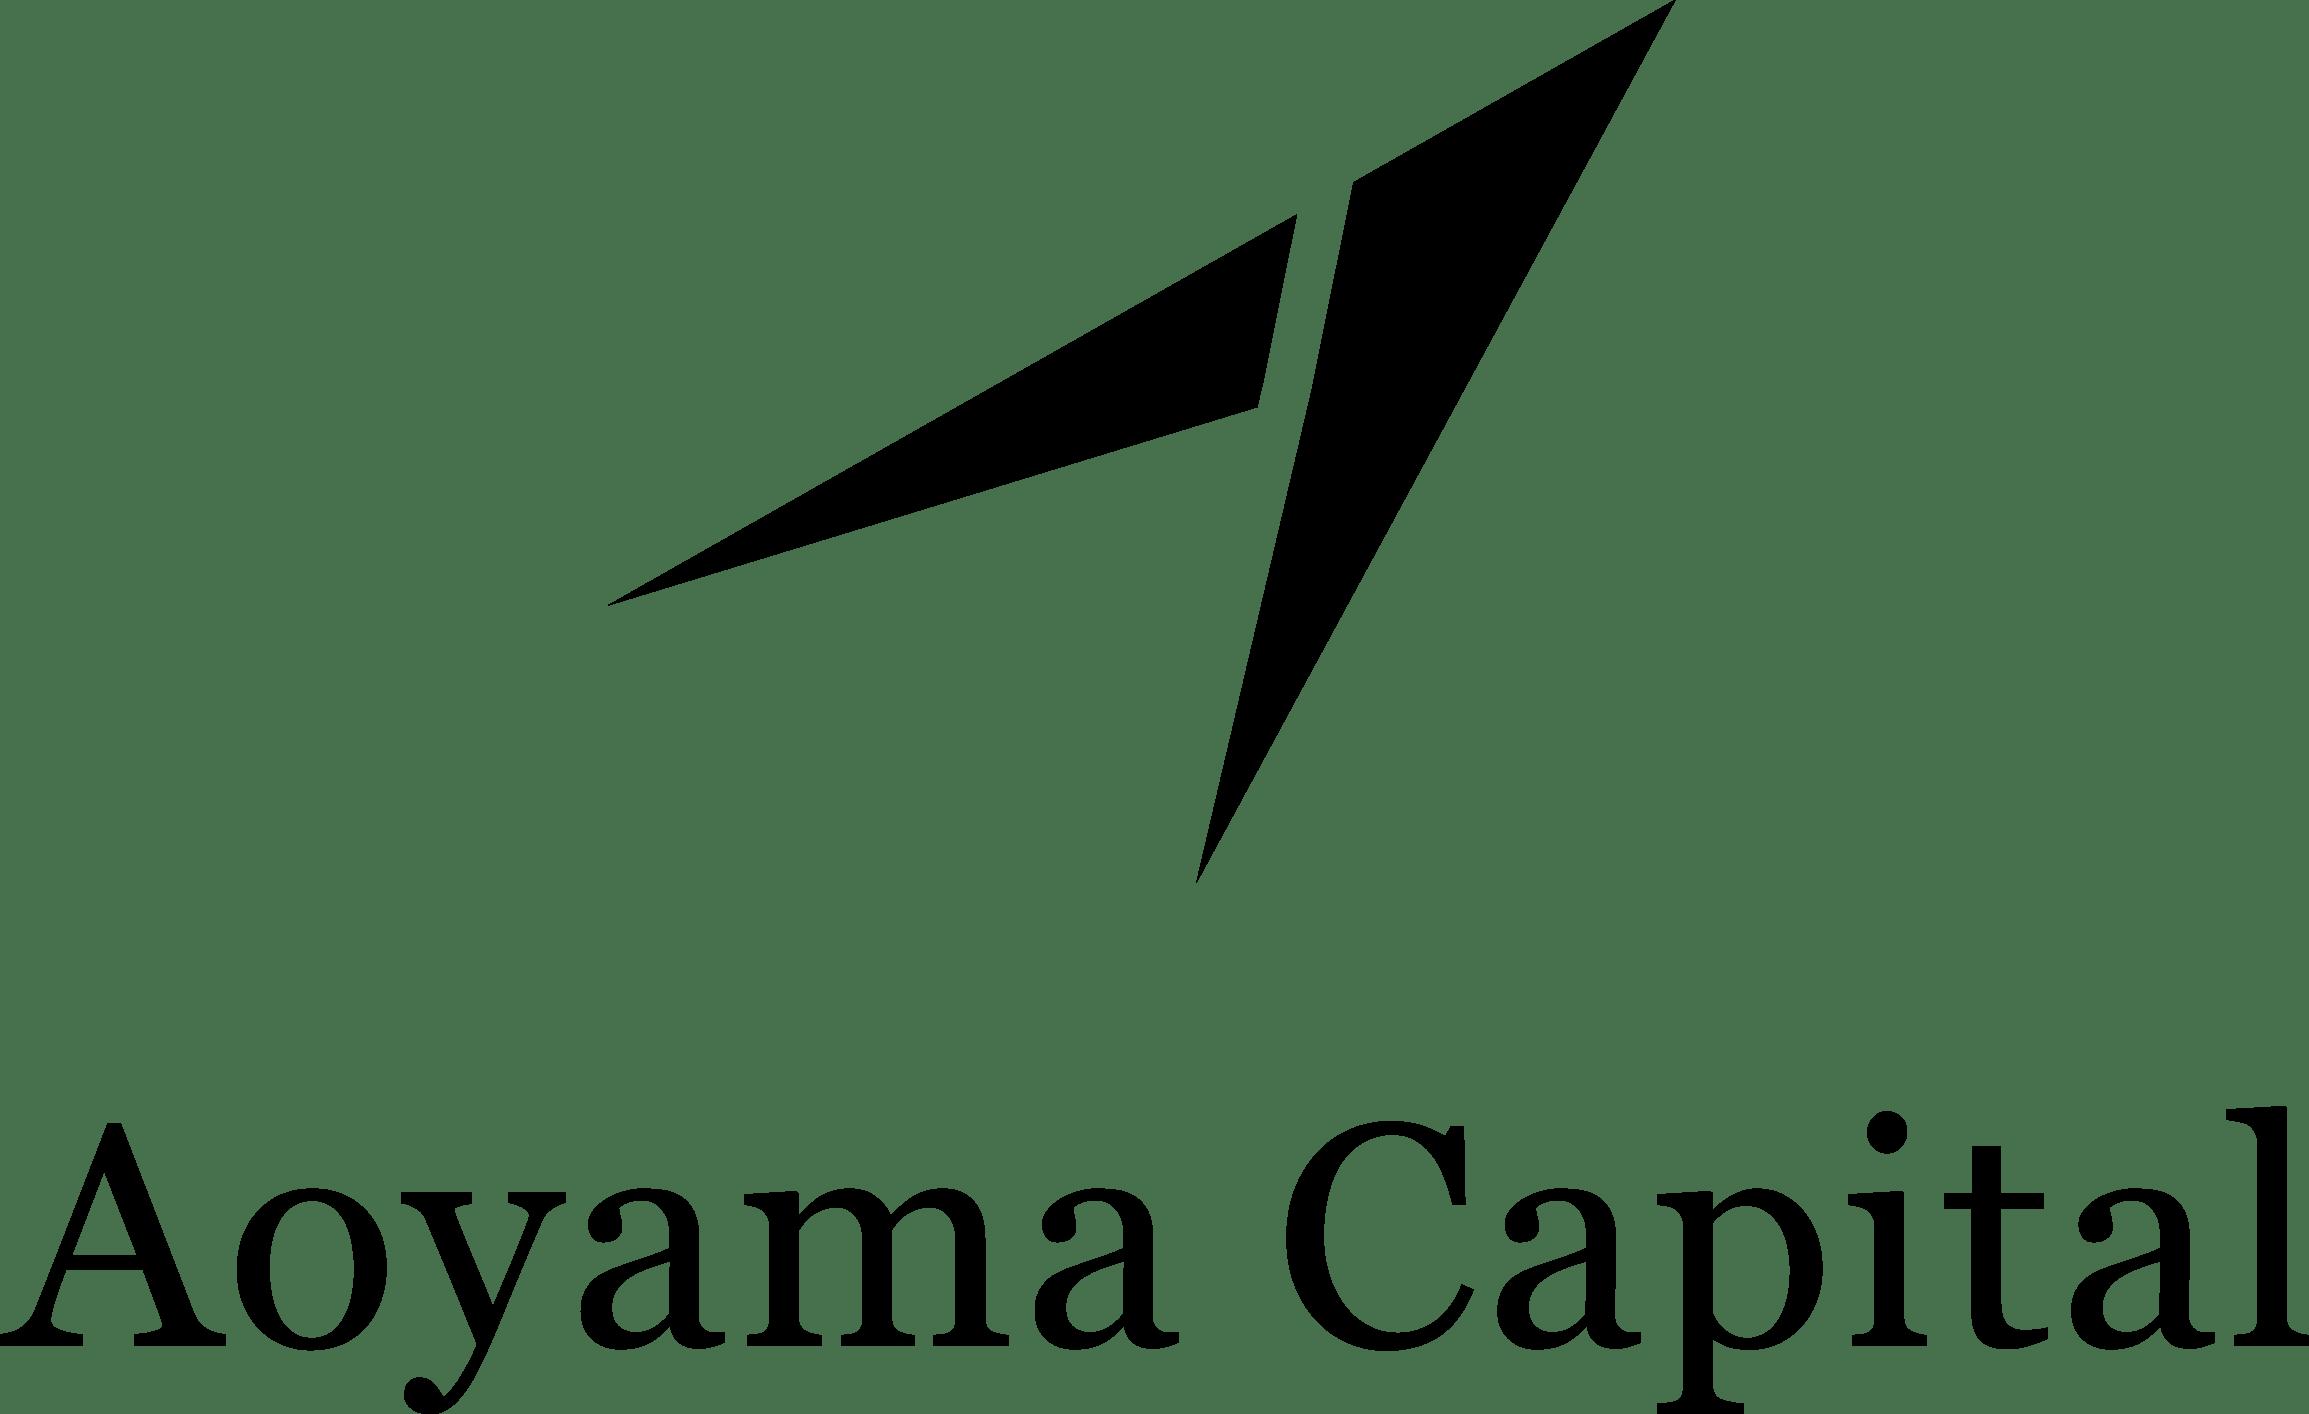 aoyama capital